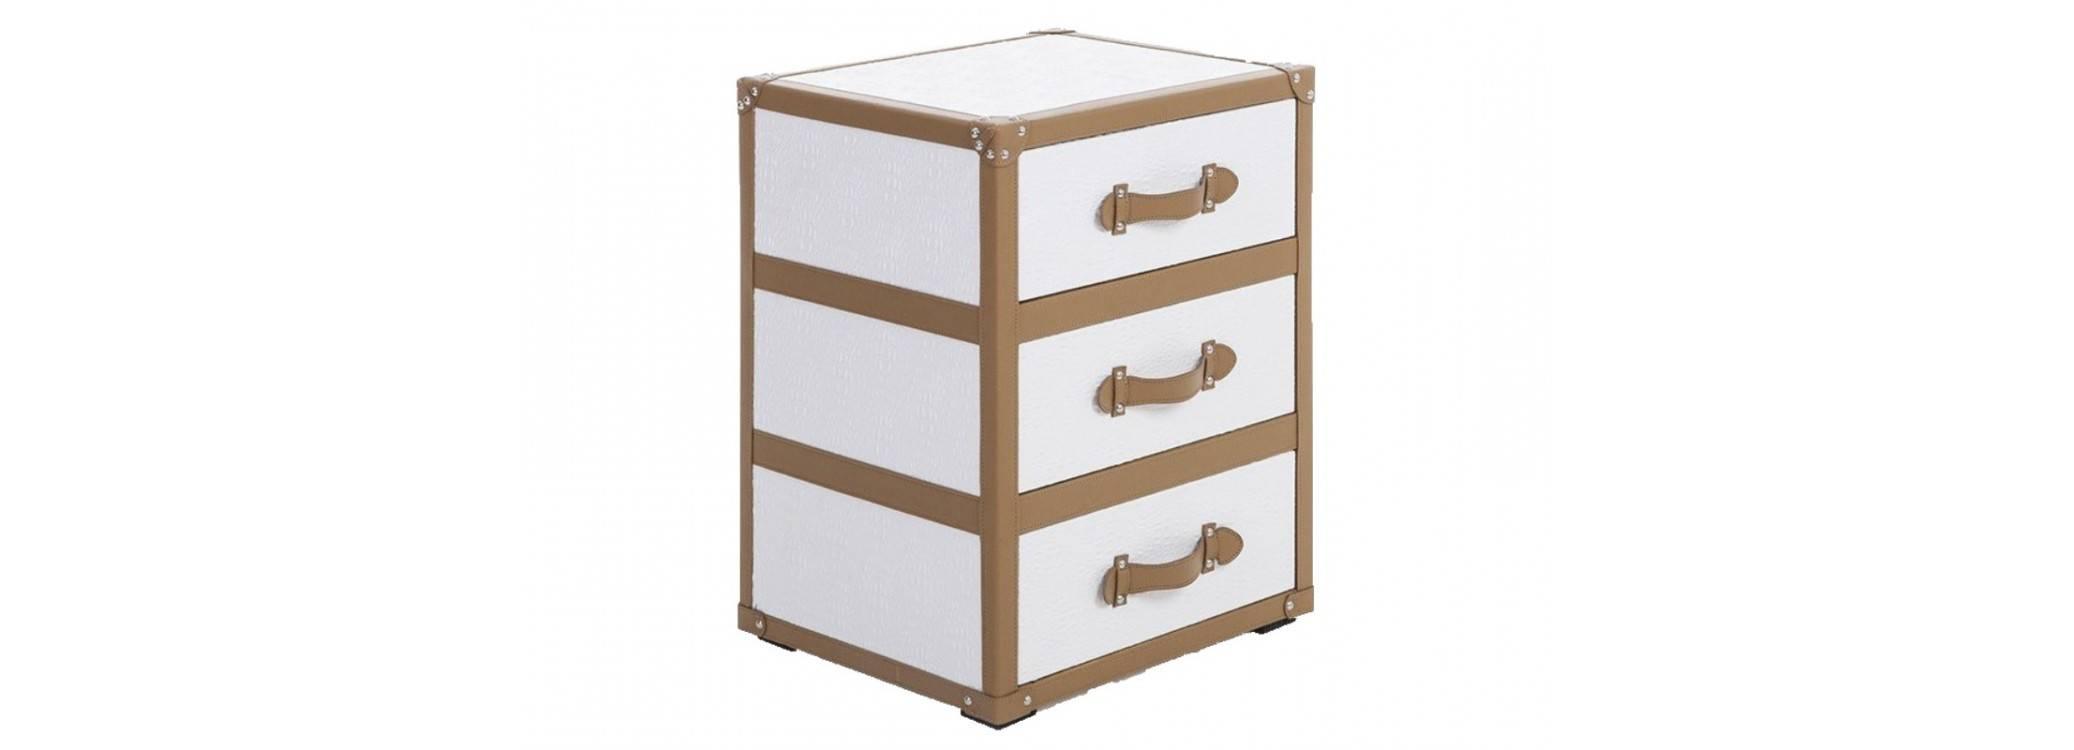 Bout de canapé Cap Horn 3 tiroirs - Blanc façon croco